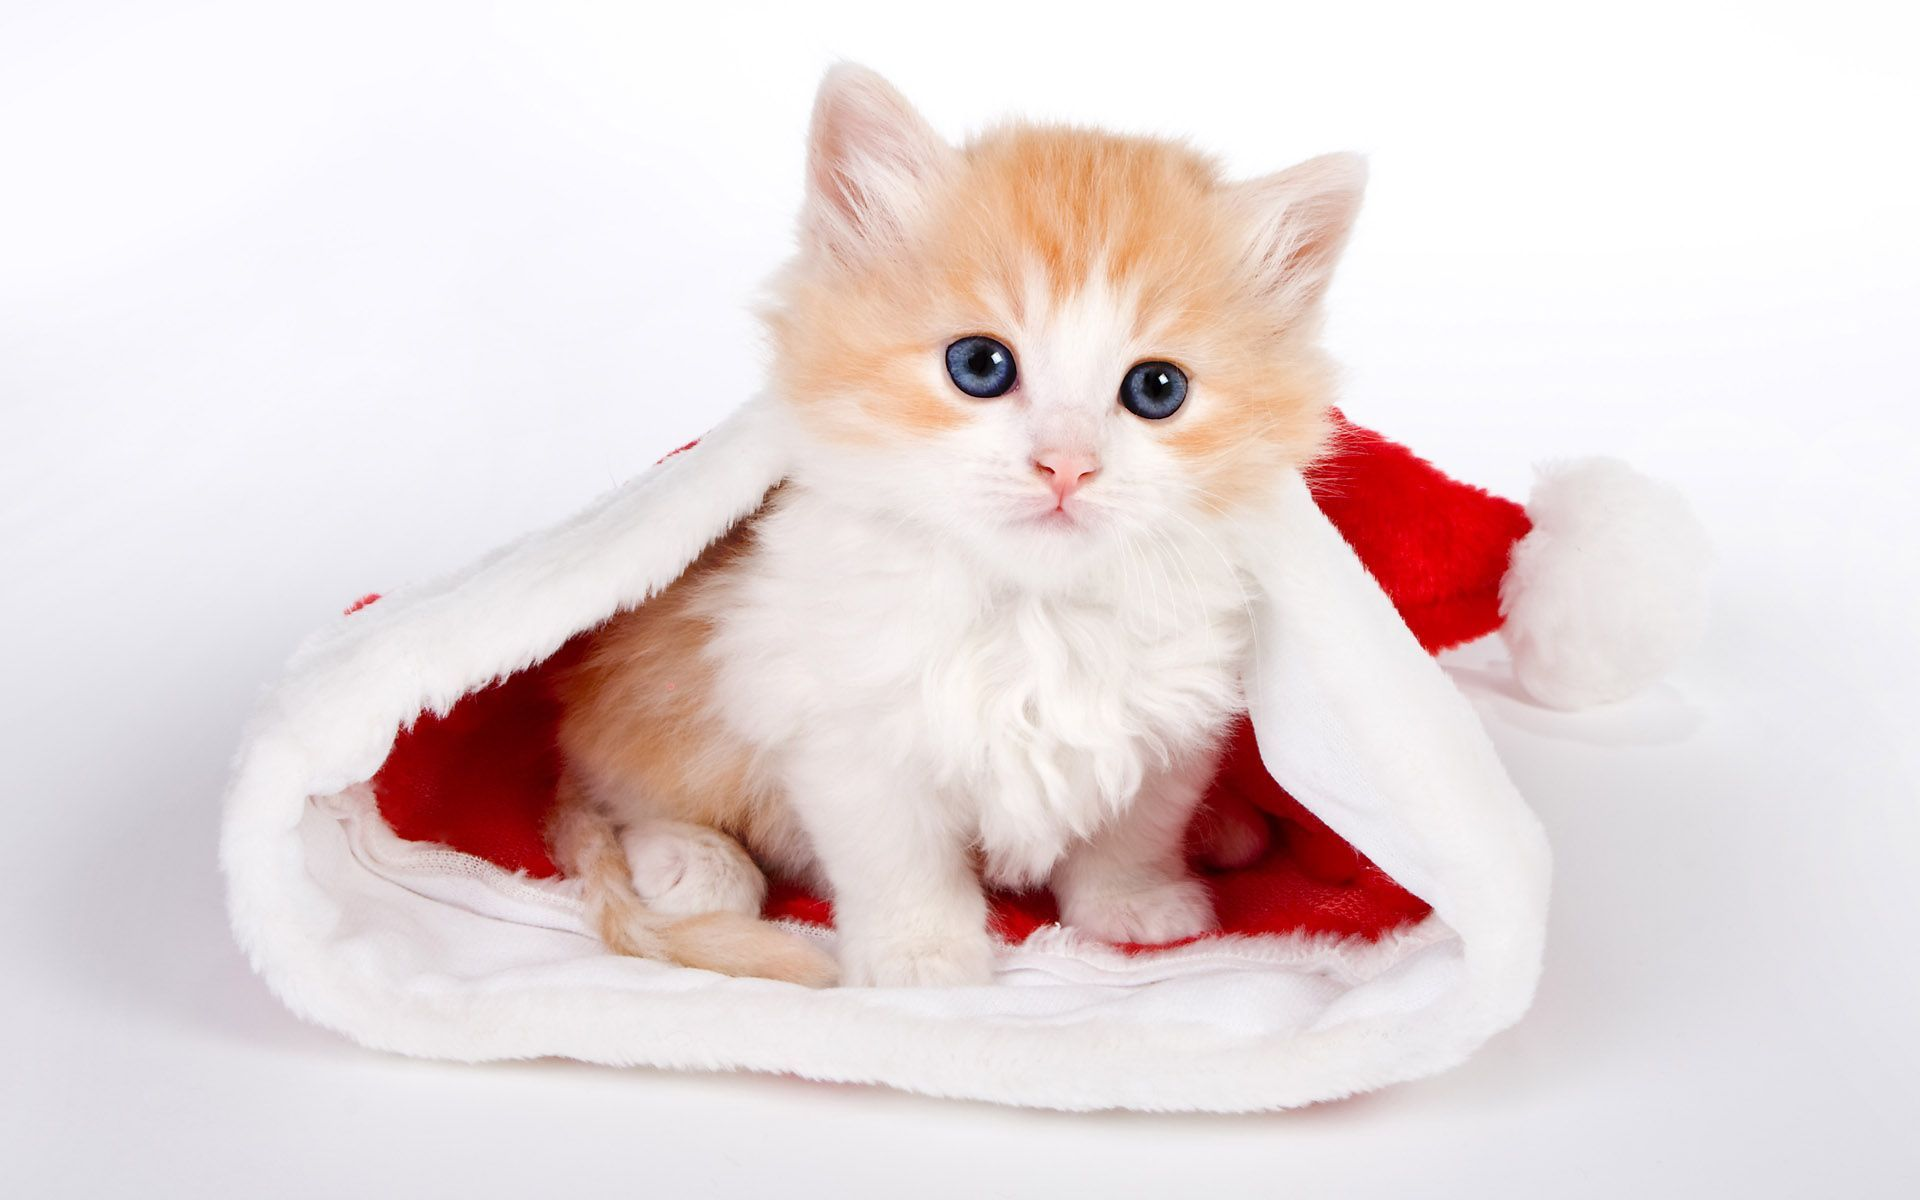 all cat wallpapers wallpapers free download cute cat wallpaper (1